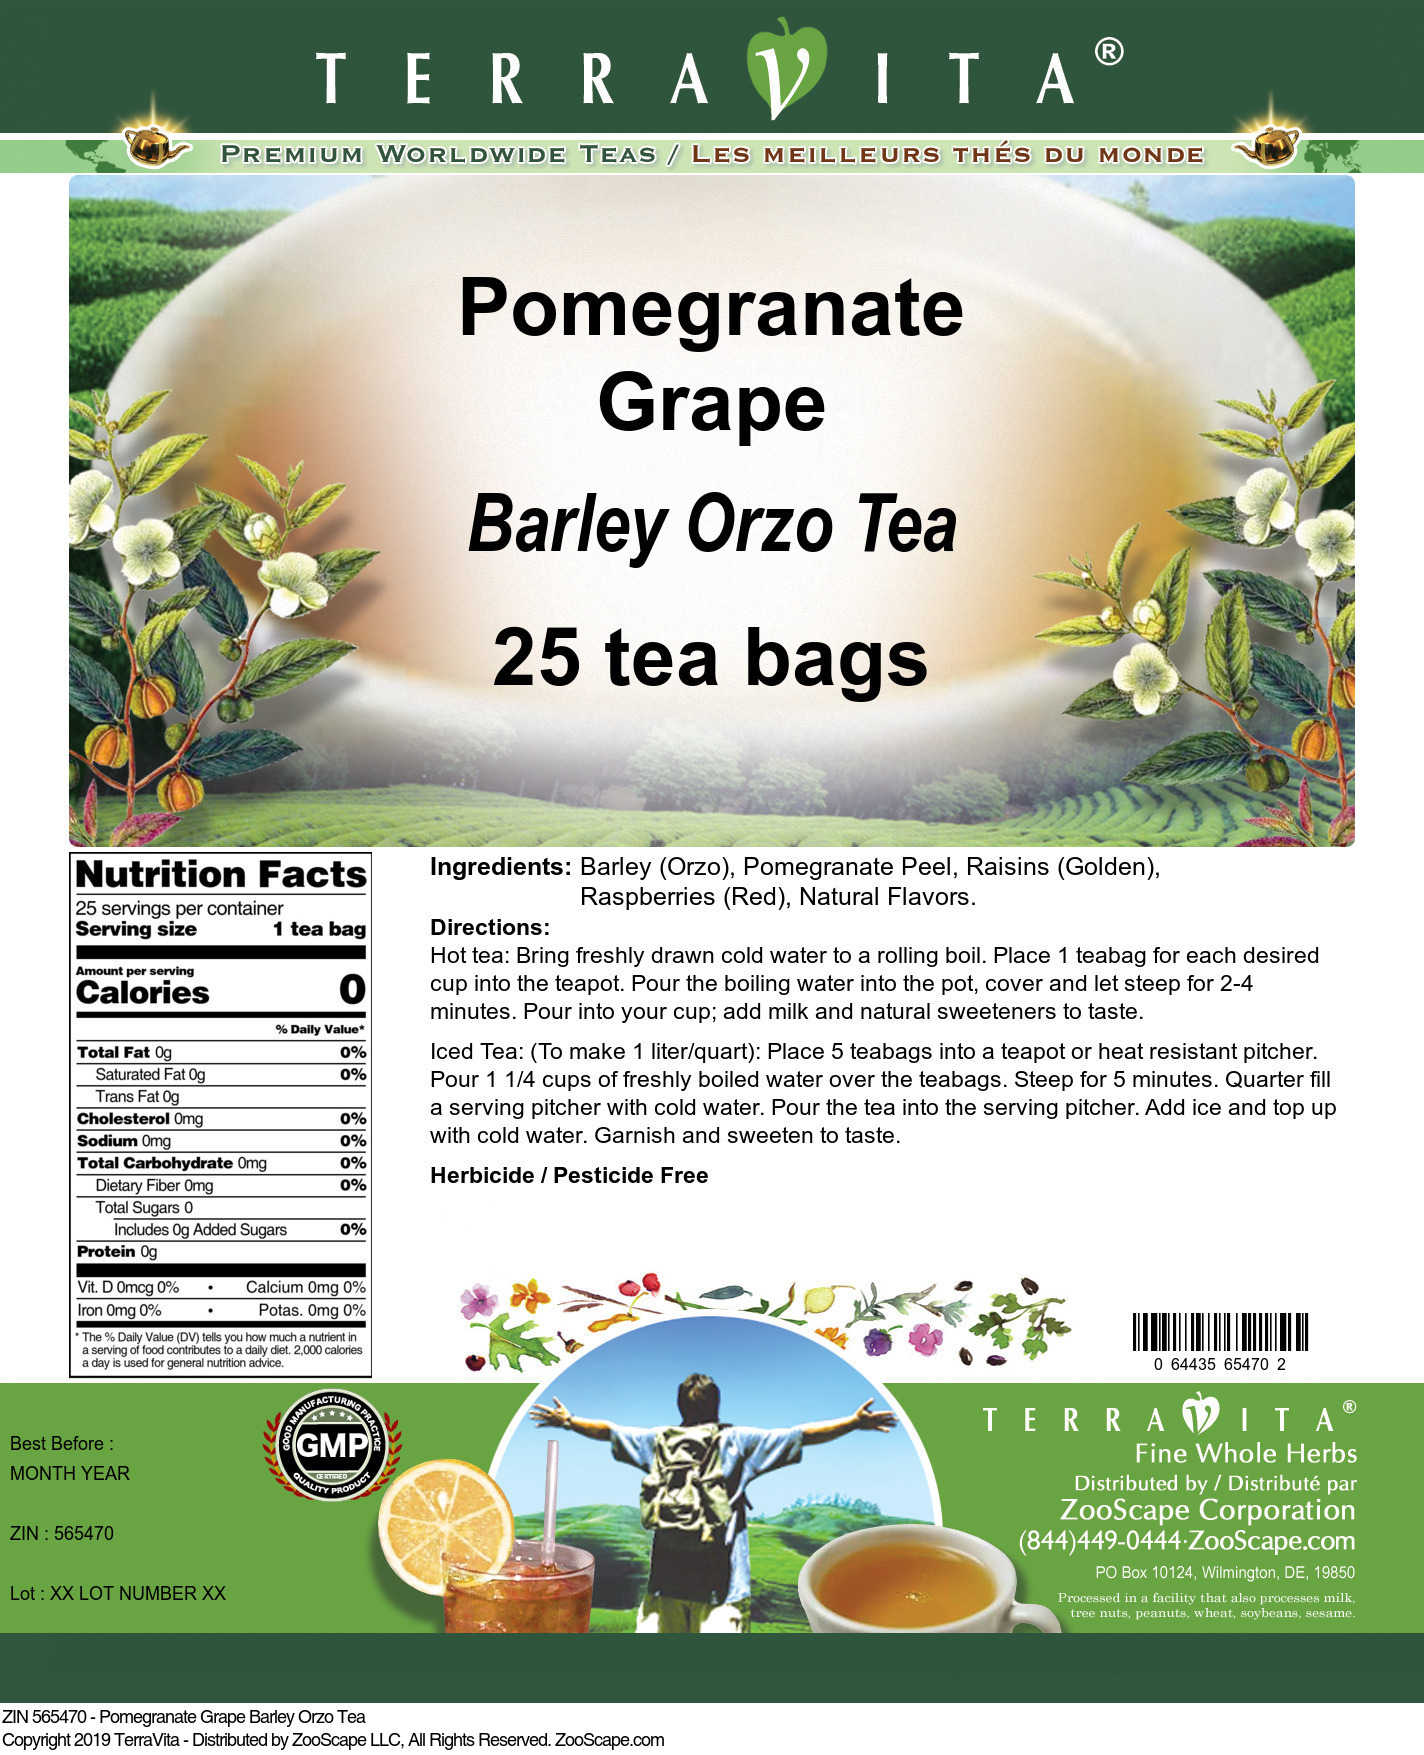 Pomegranate Grape Barley Orzo Tea